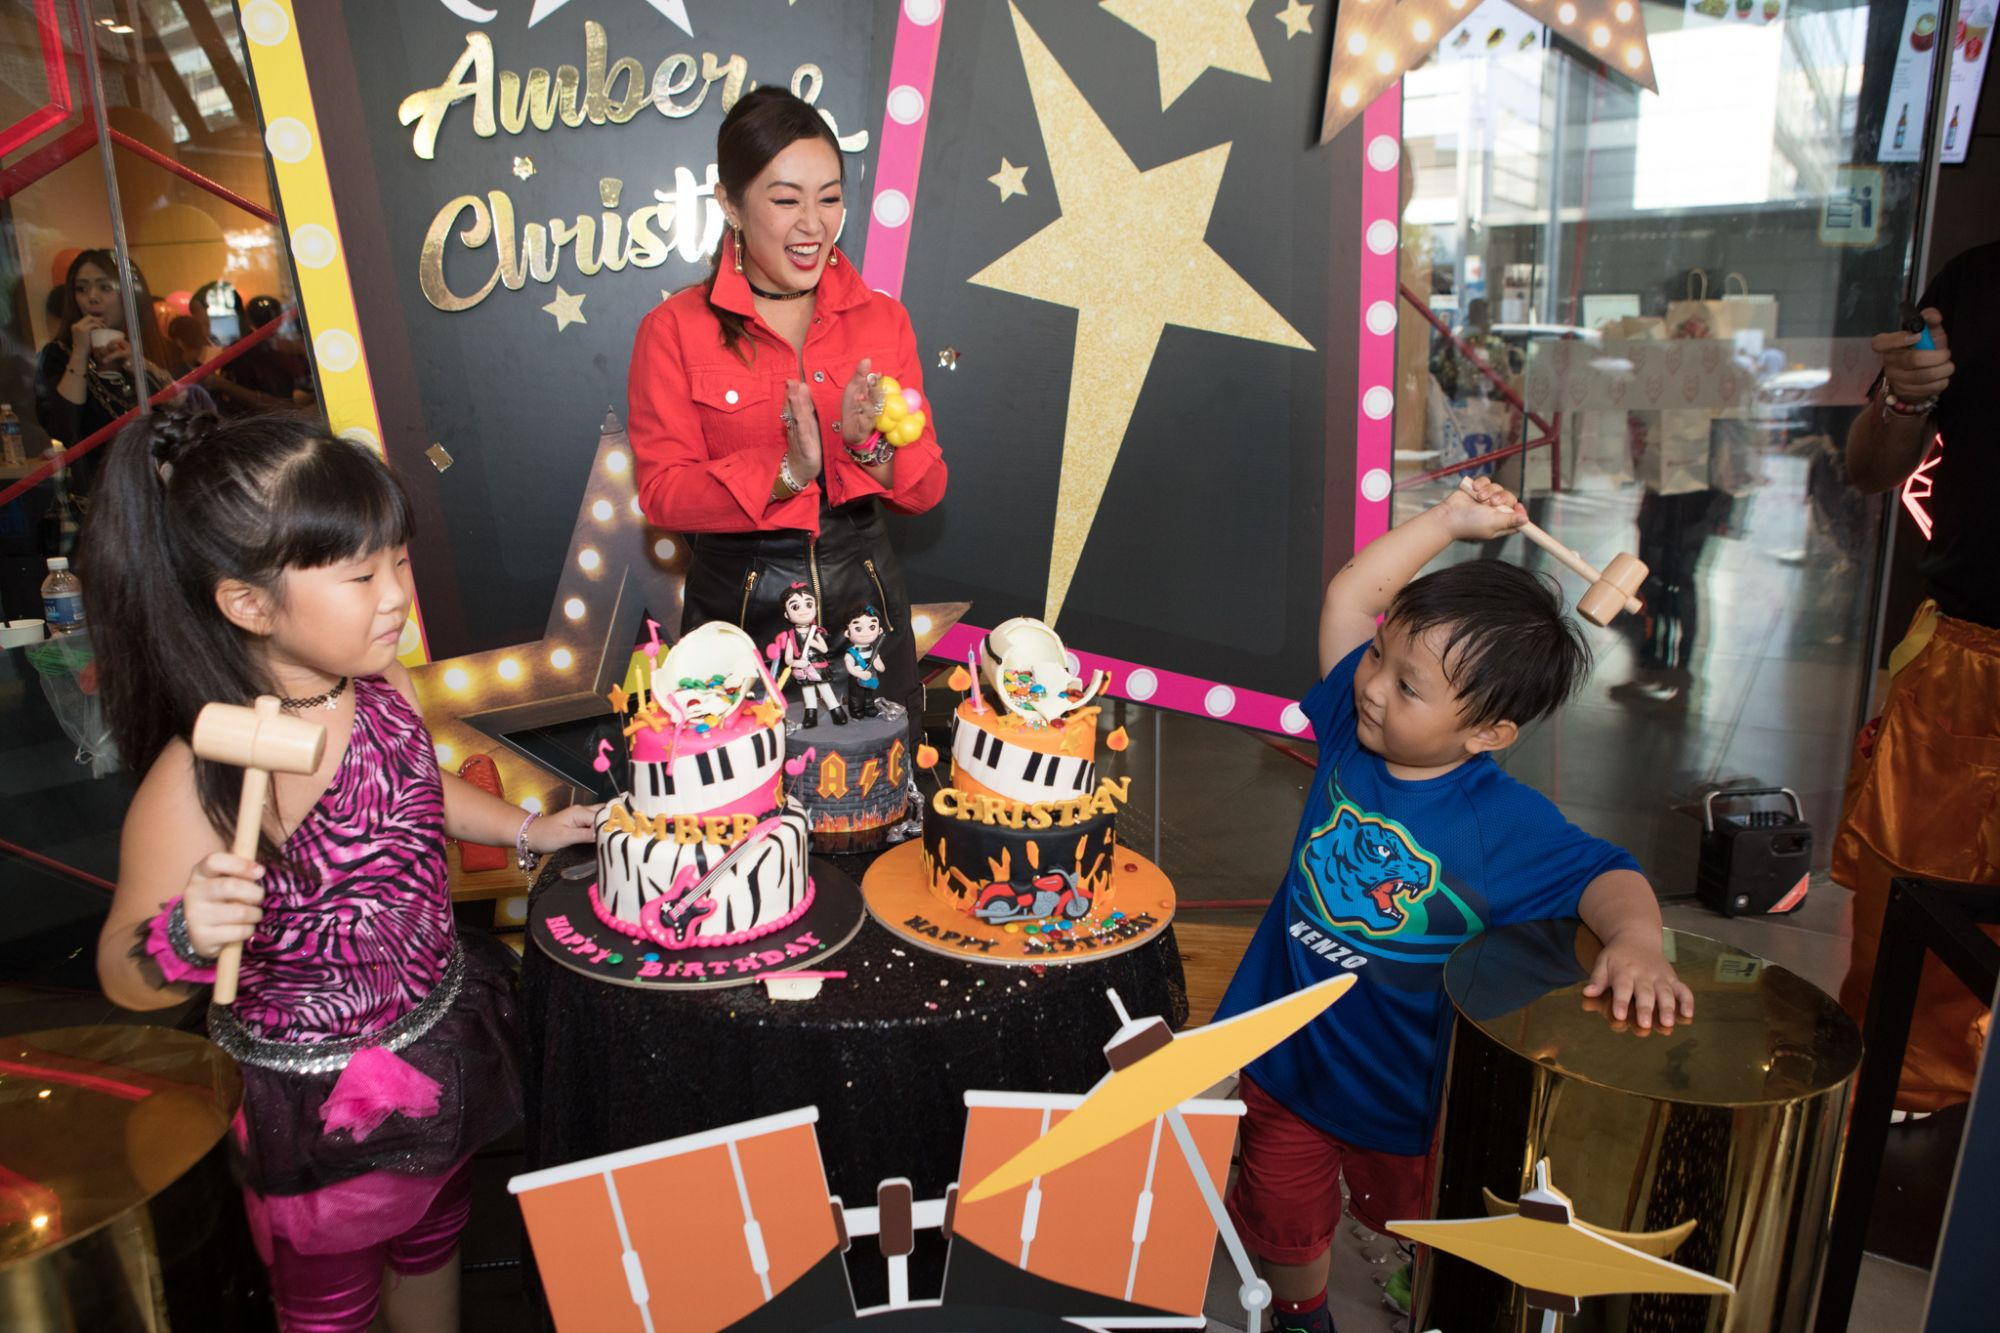 Amber, Serene Chua, Christian